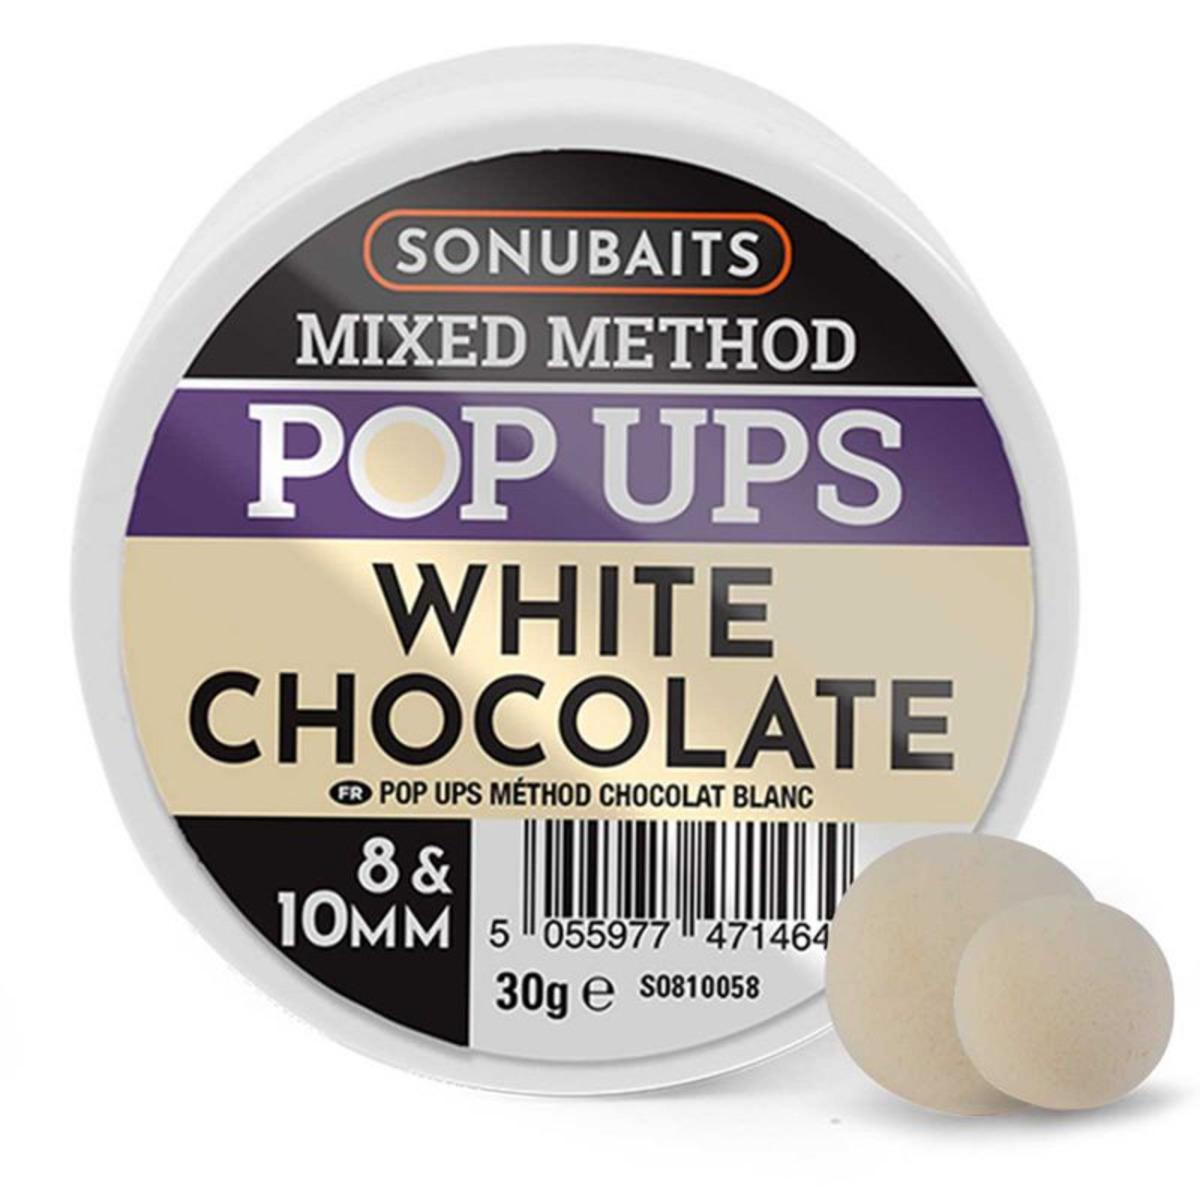 Sonubaits Mixed Method Pop Ups - 8 - 10 mm - Cioccolato Bianco